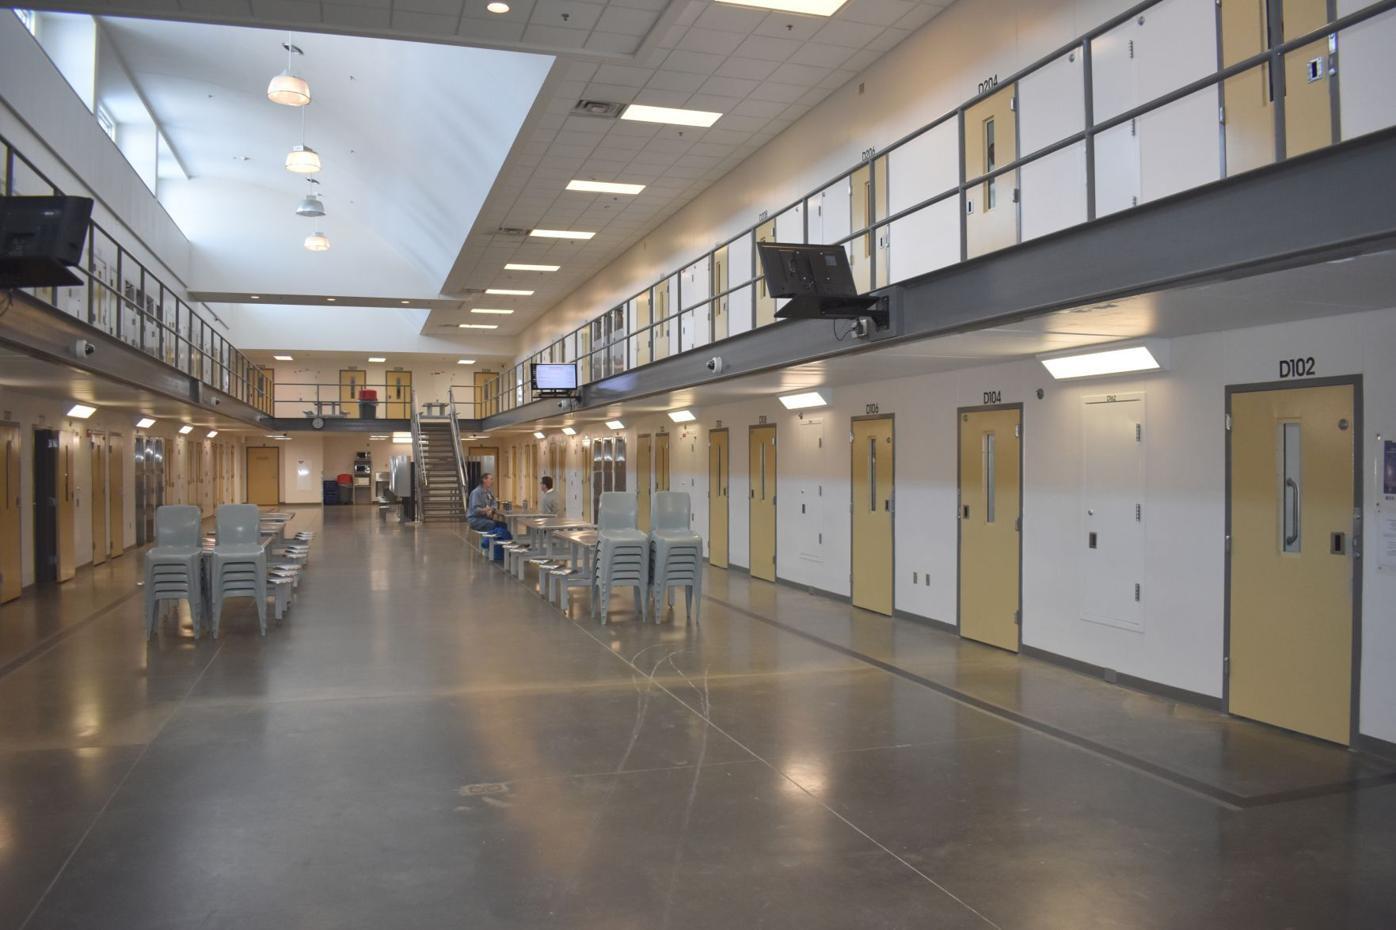 Faribault Prison